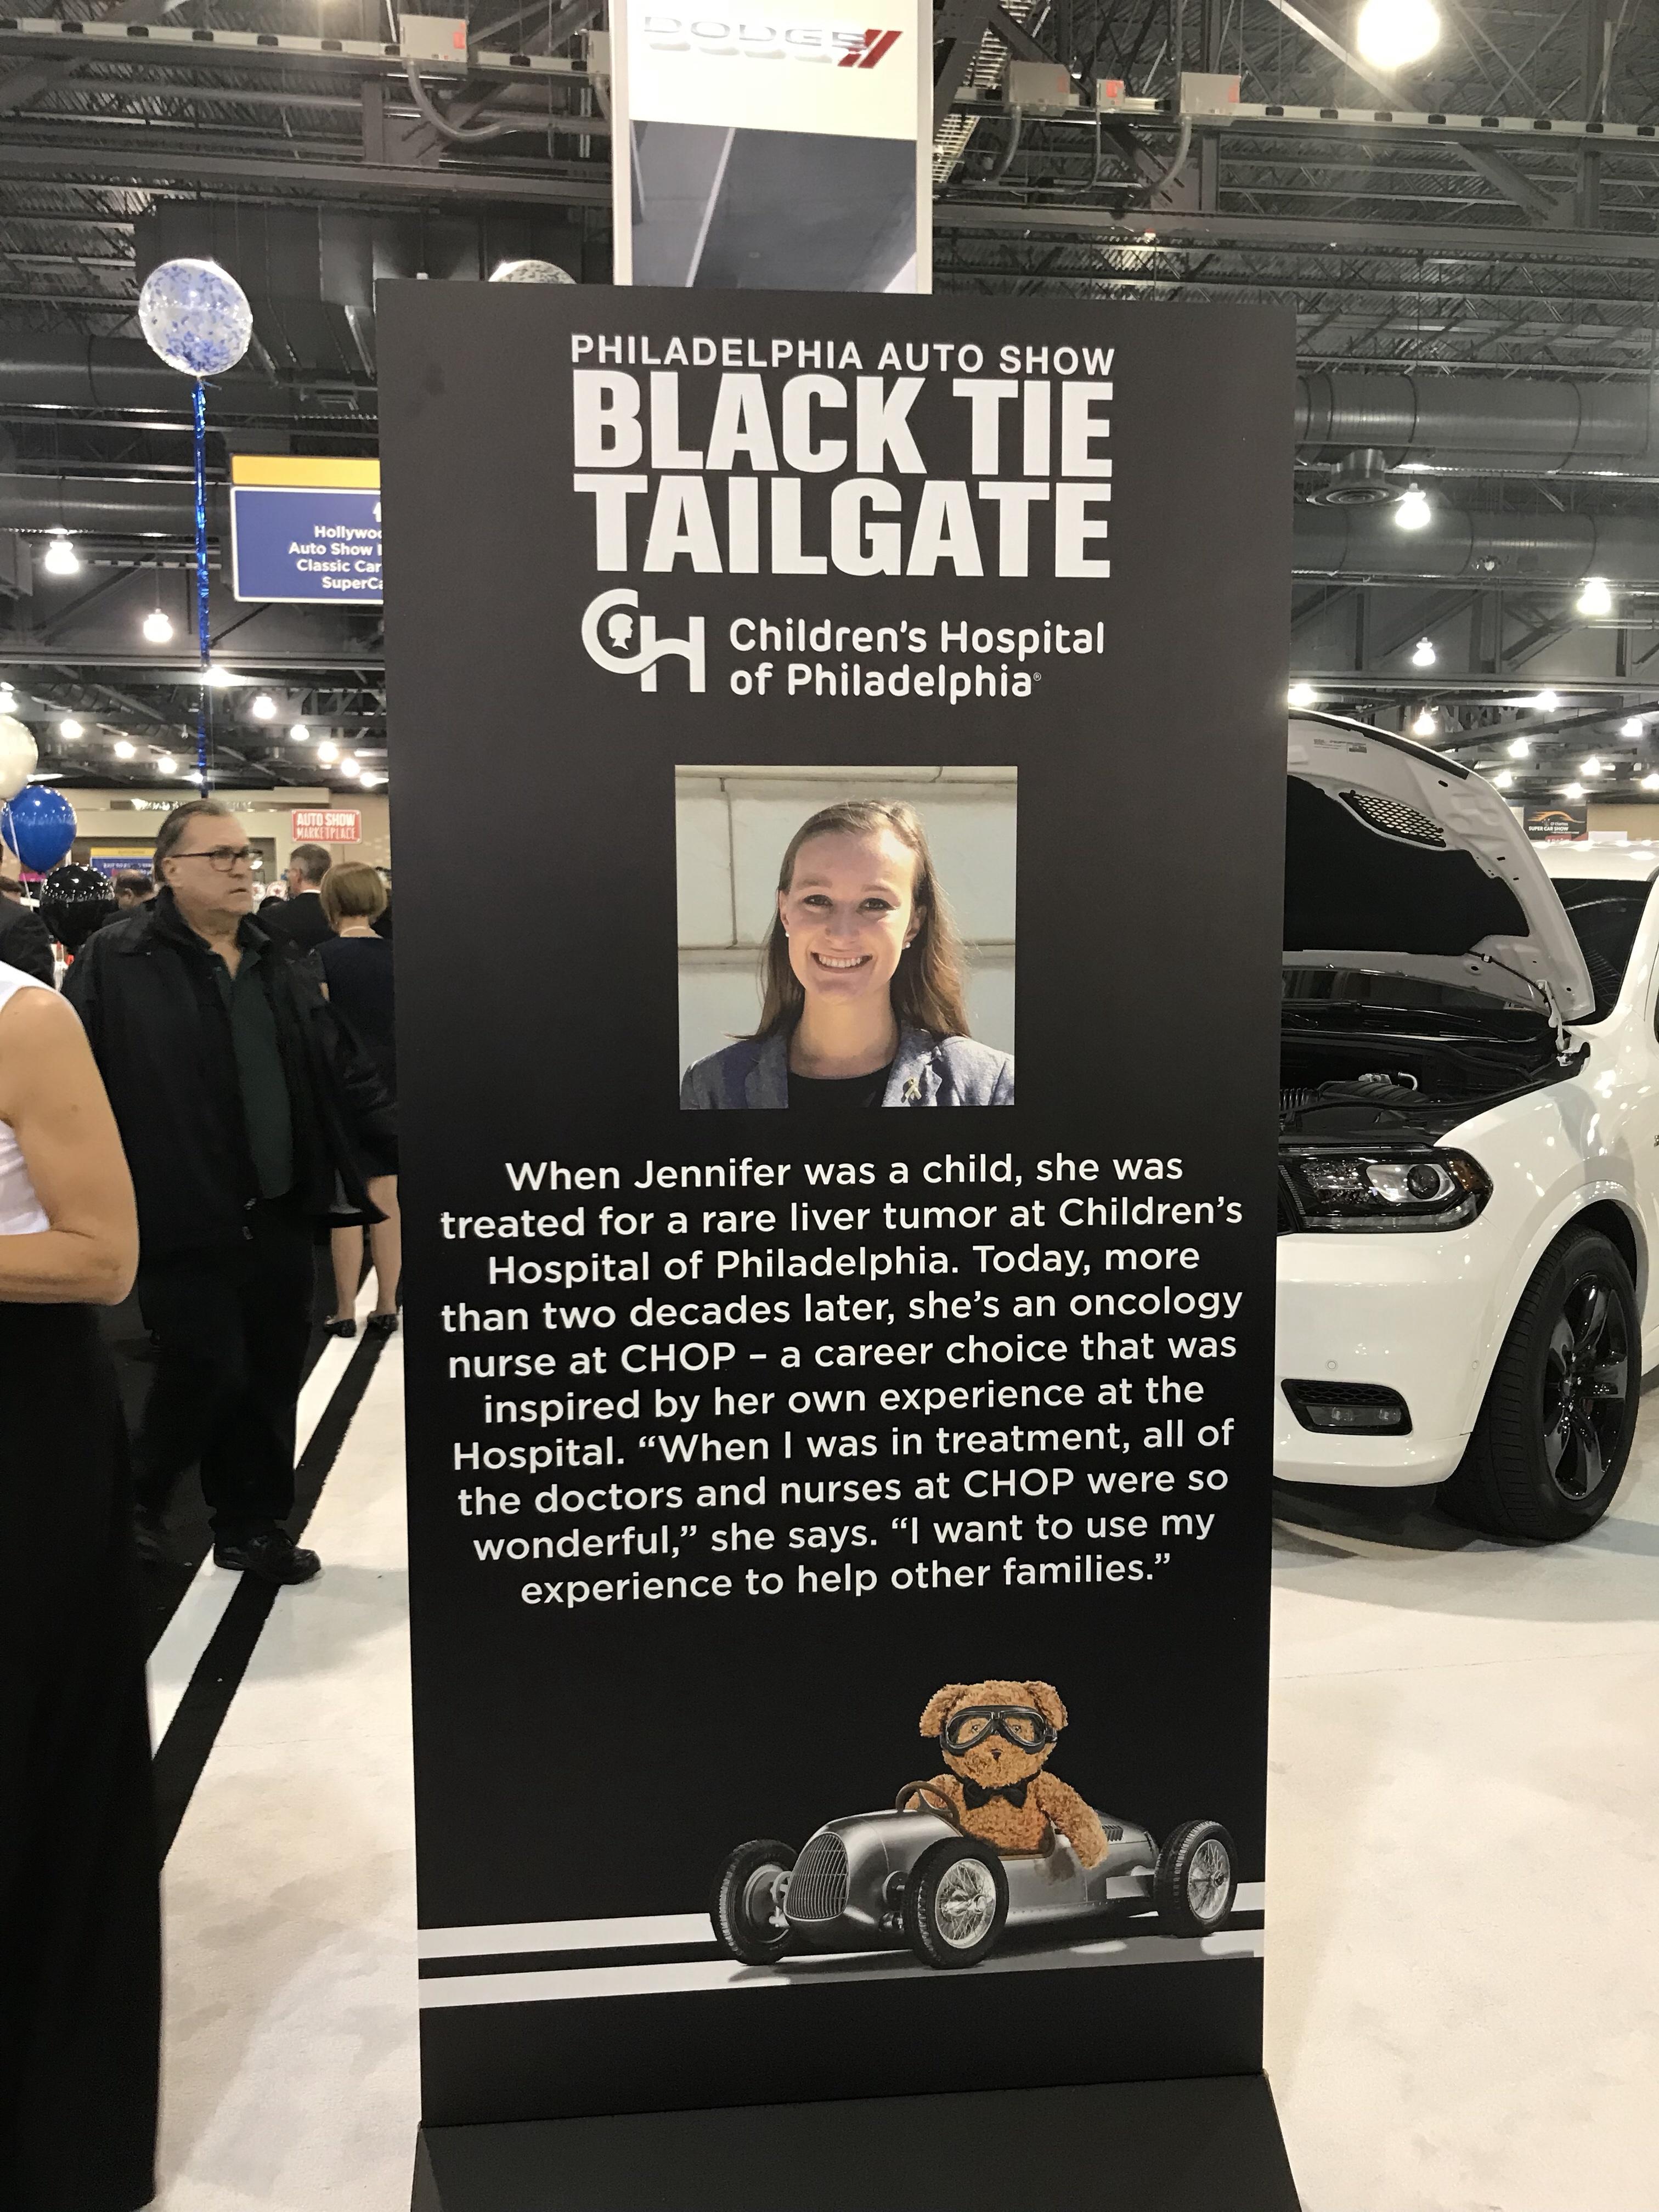 Black Tie Tailgate Recap Vida Fashionista - Black tie event philadelphia car show